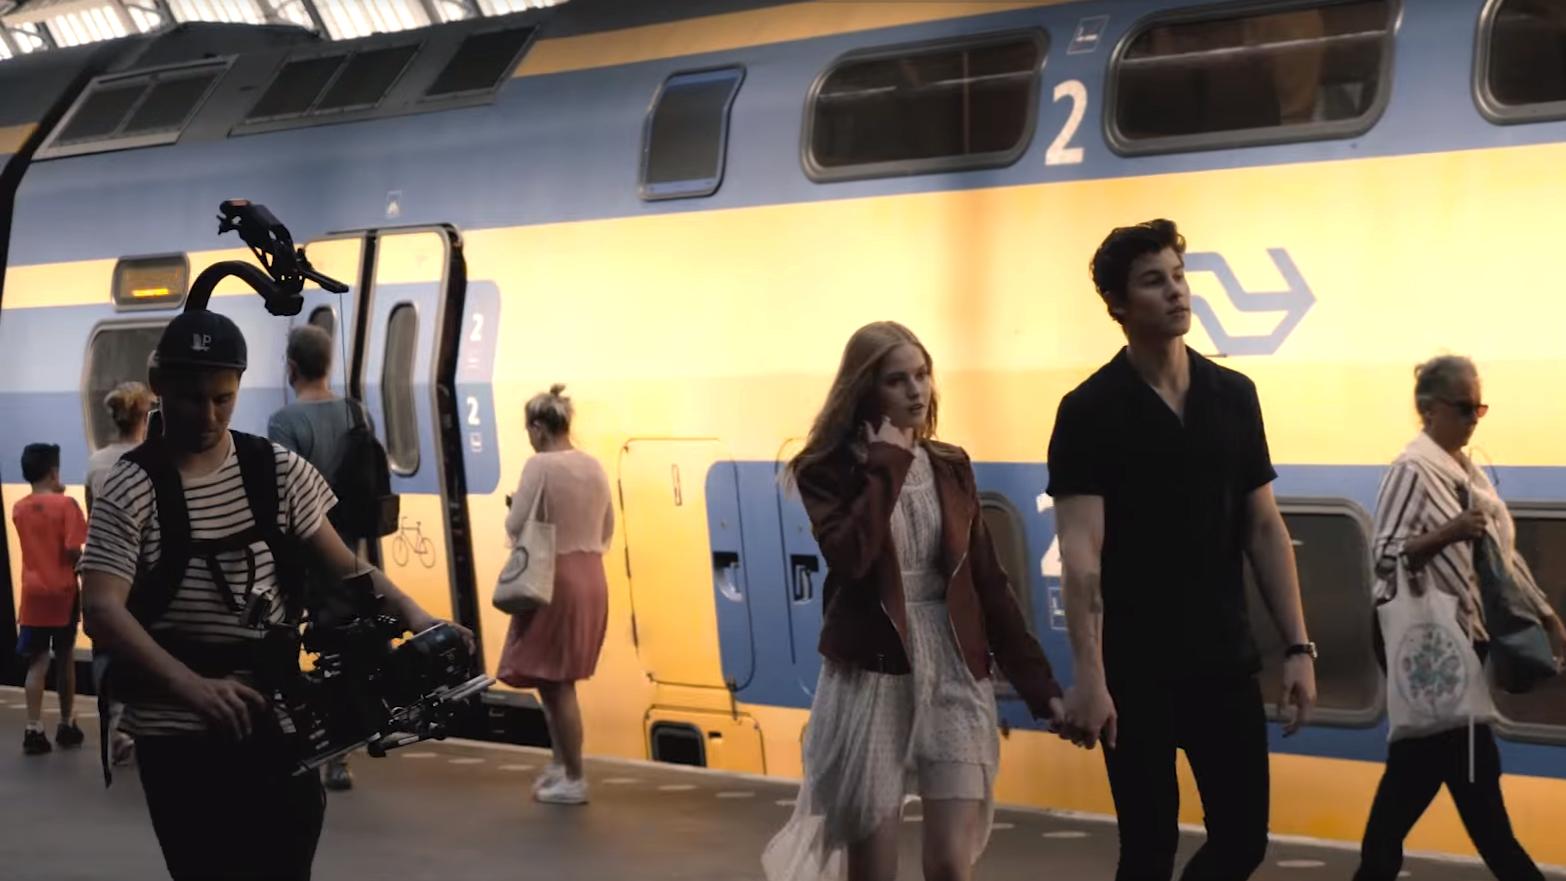 Shawnamsterdam teaser